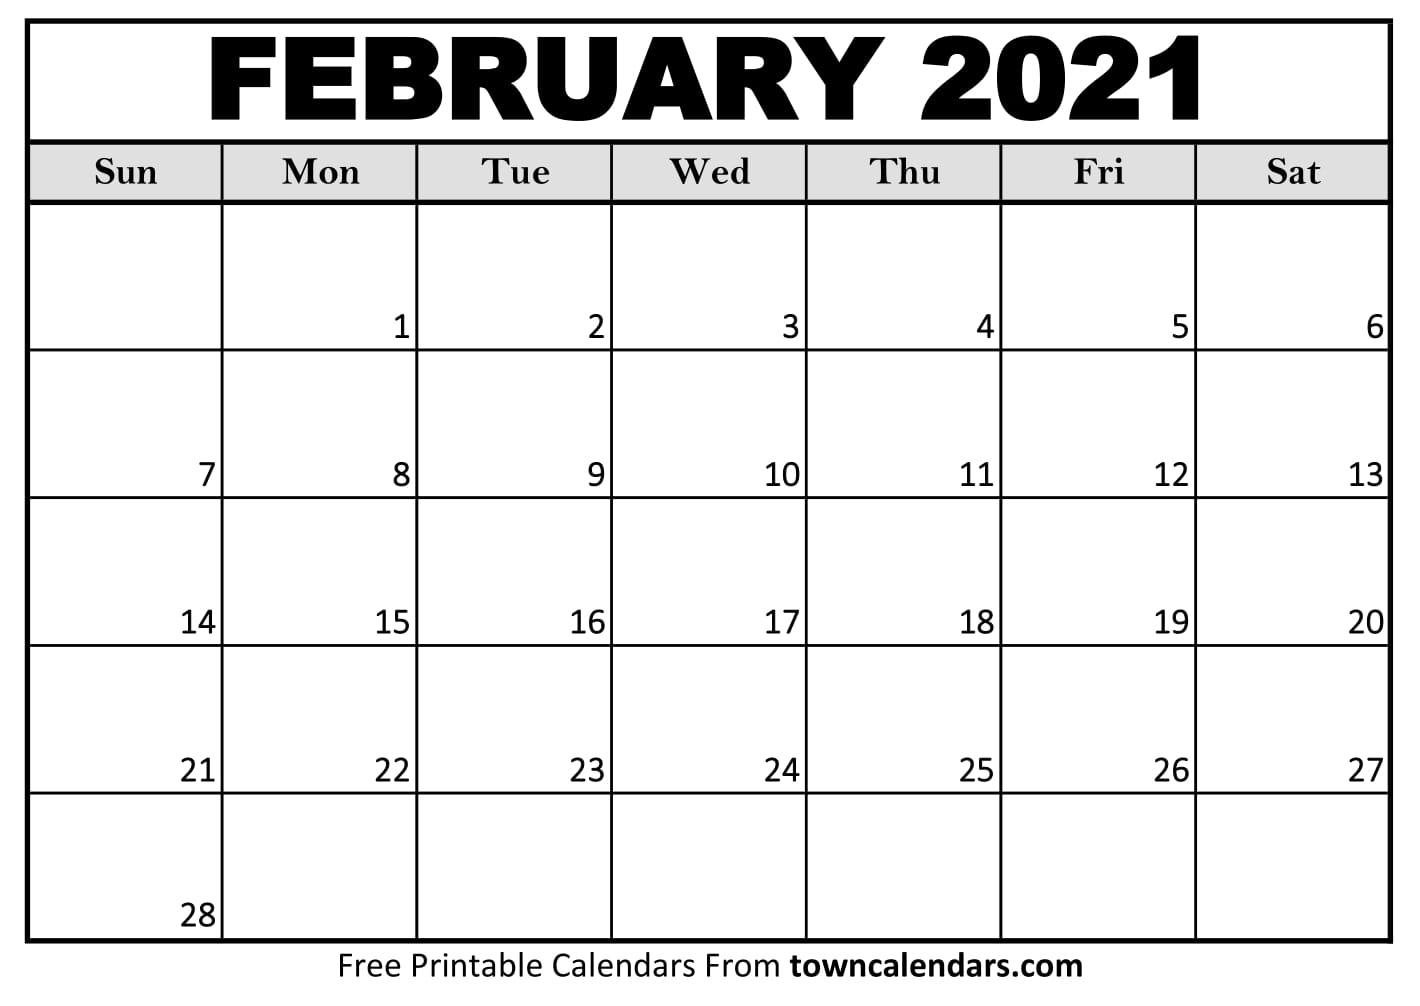 Printable February 2021 Calendar - Towncalendars